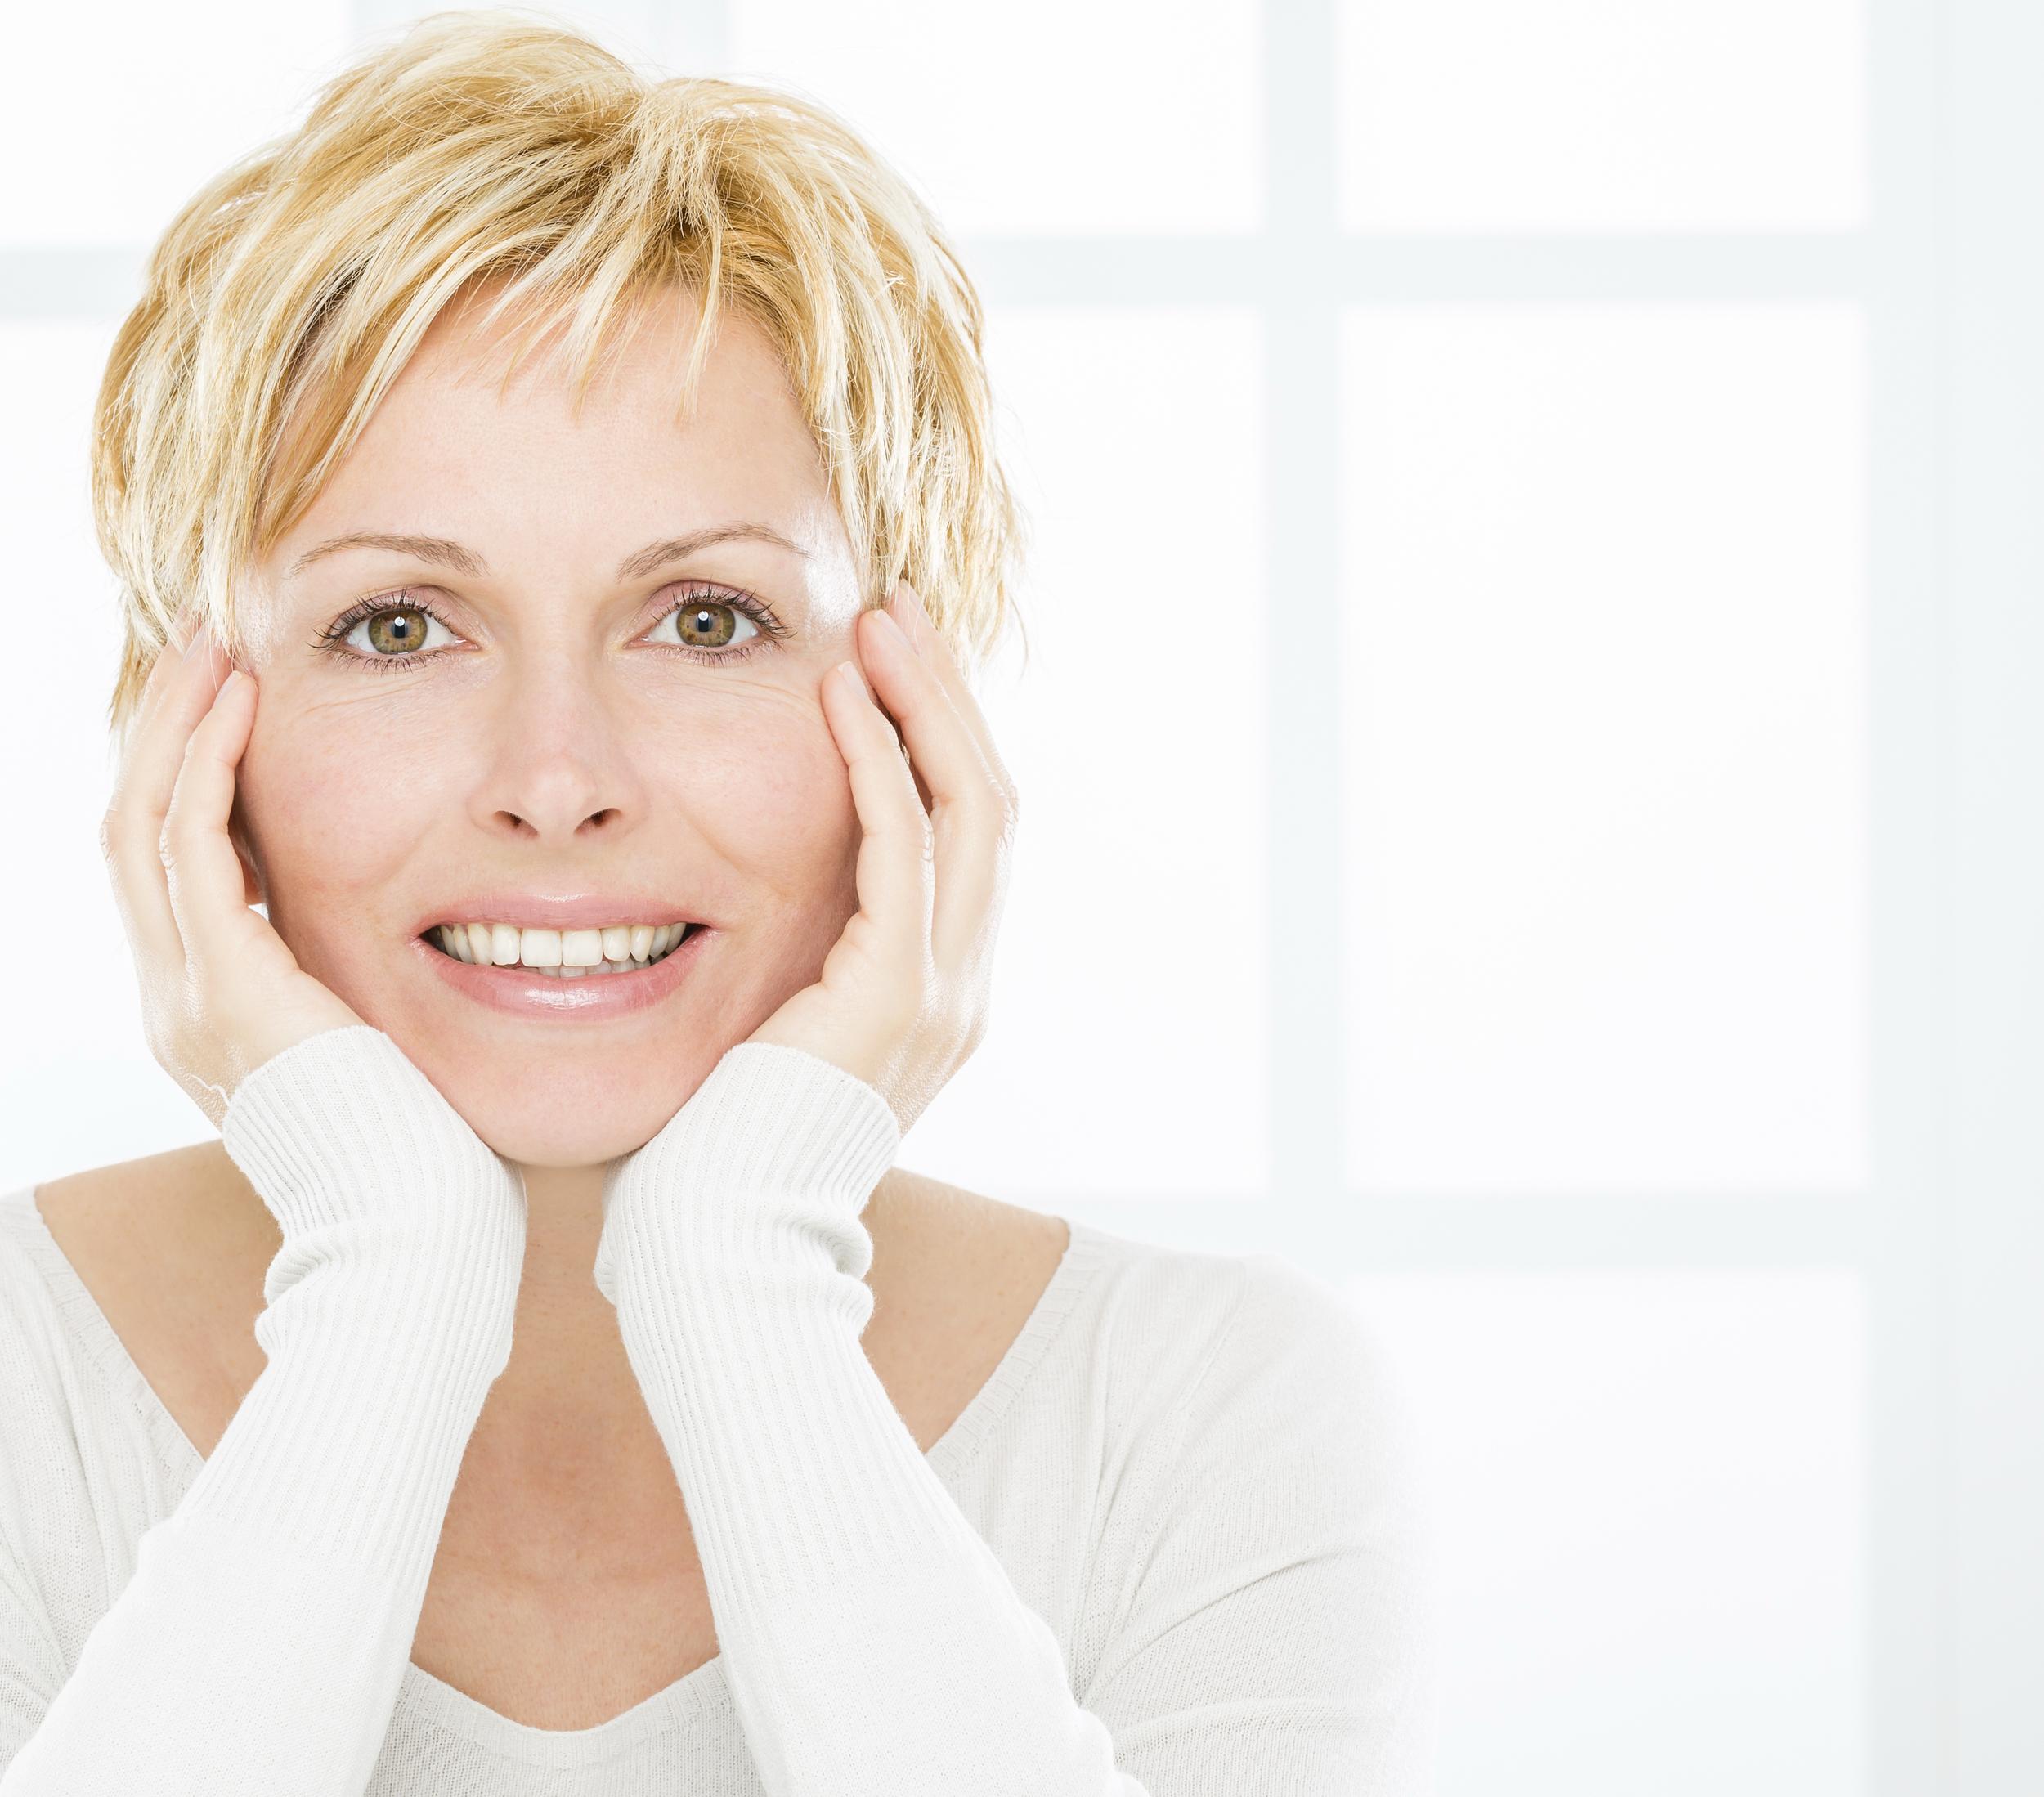 blonde-woman-smiling.jpg